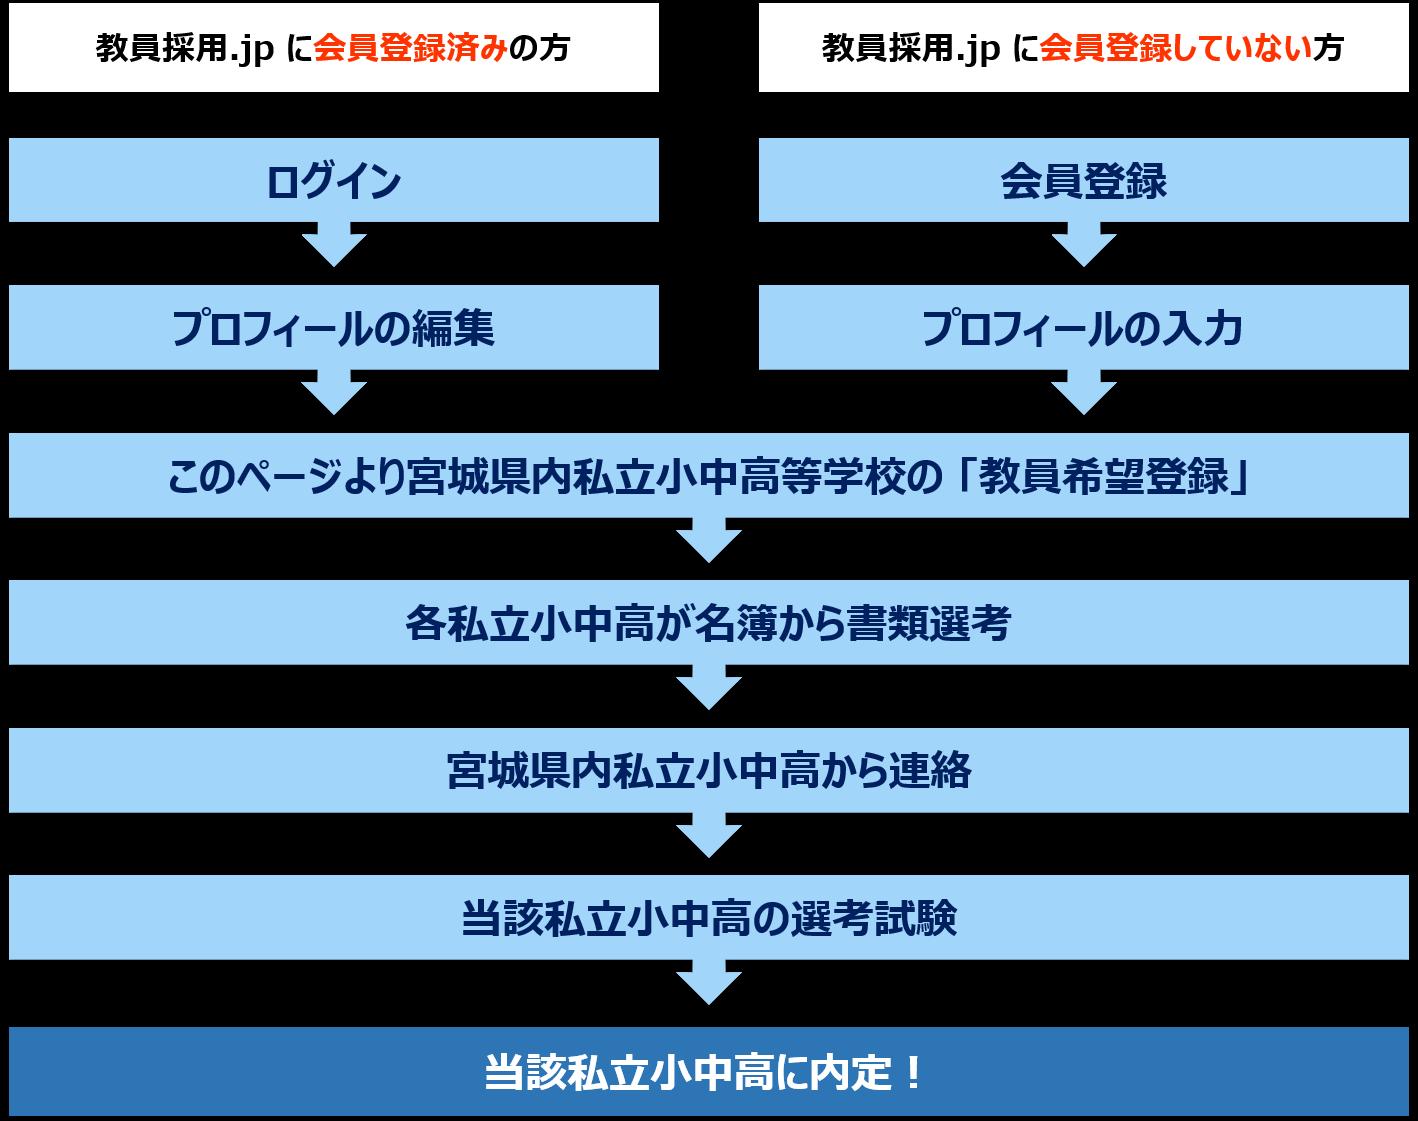 採用 宮城 県庁 宮城県庁の採用情報(初任給/従業員/福利厚生)|リクナビ2022